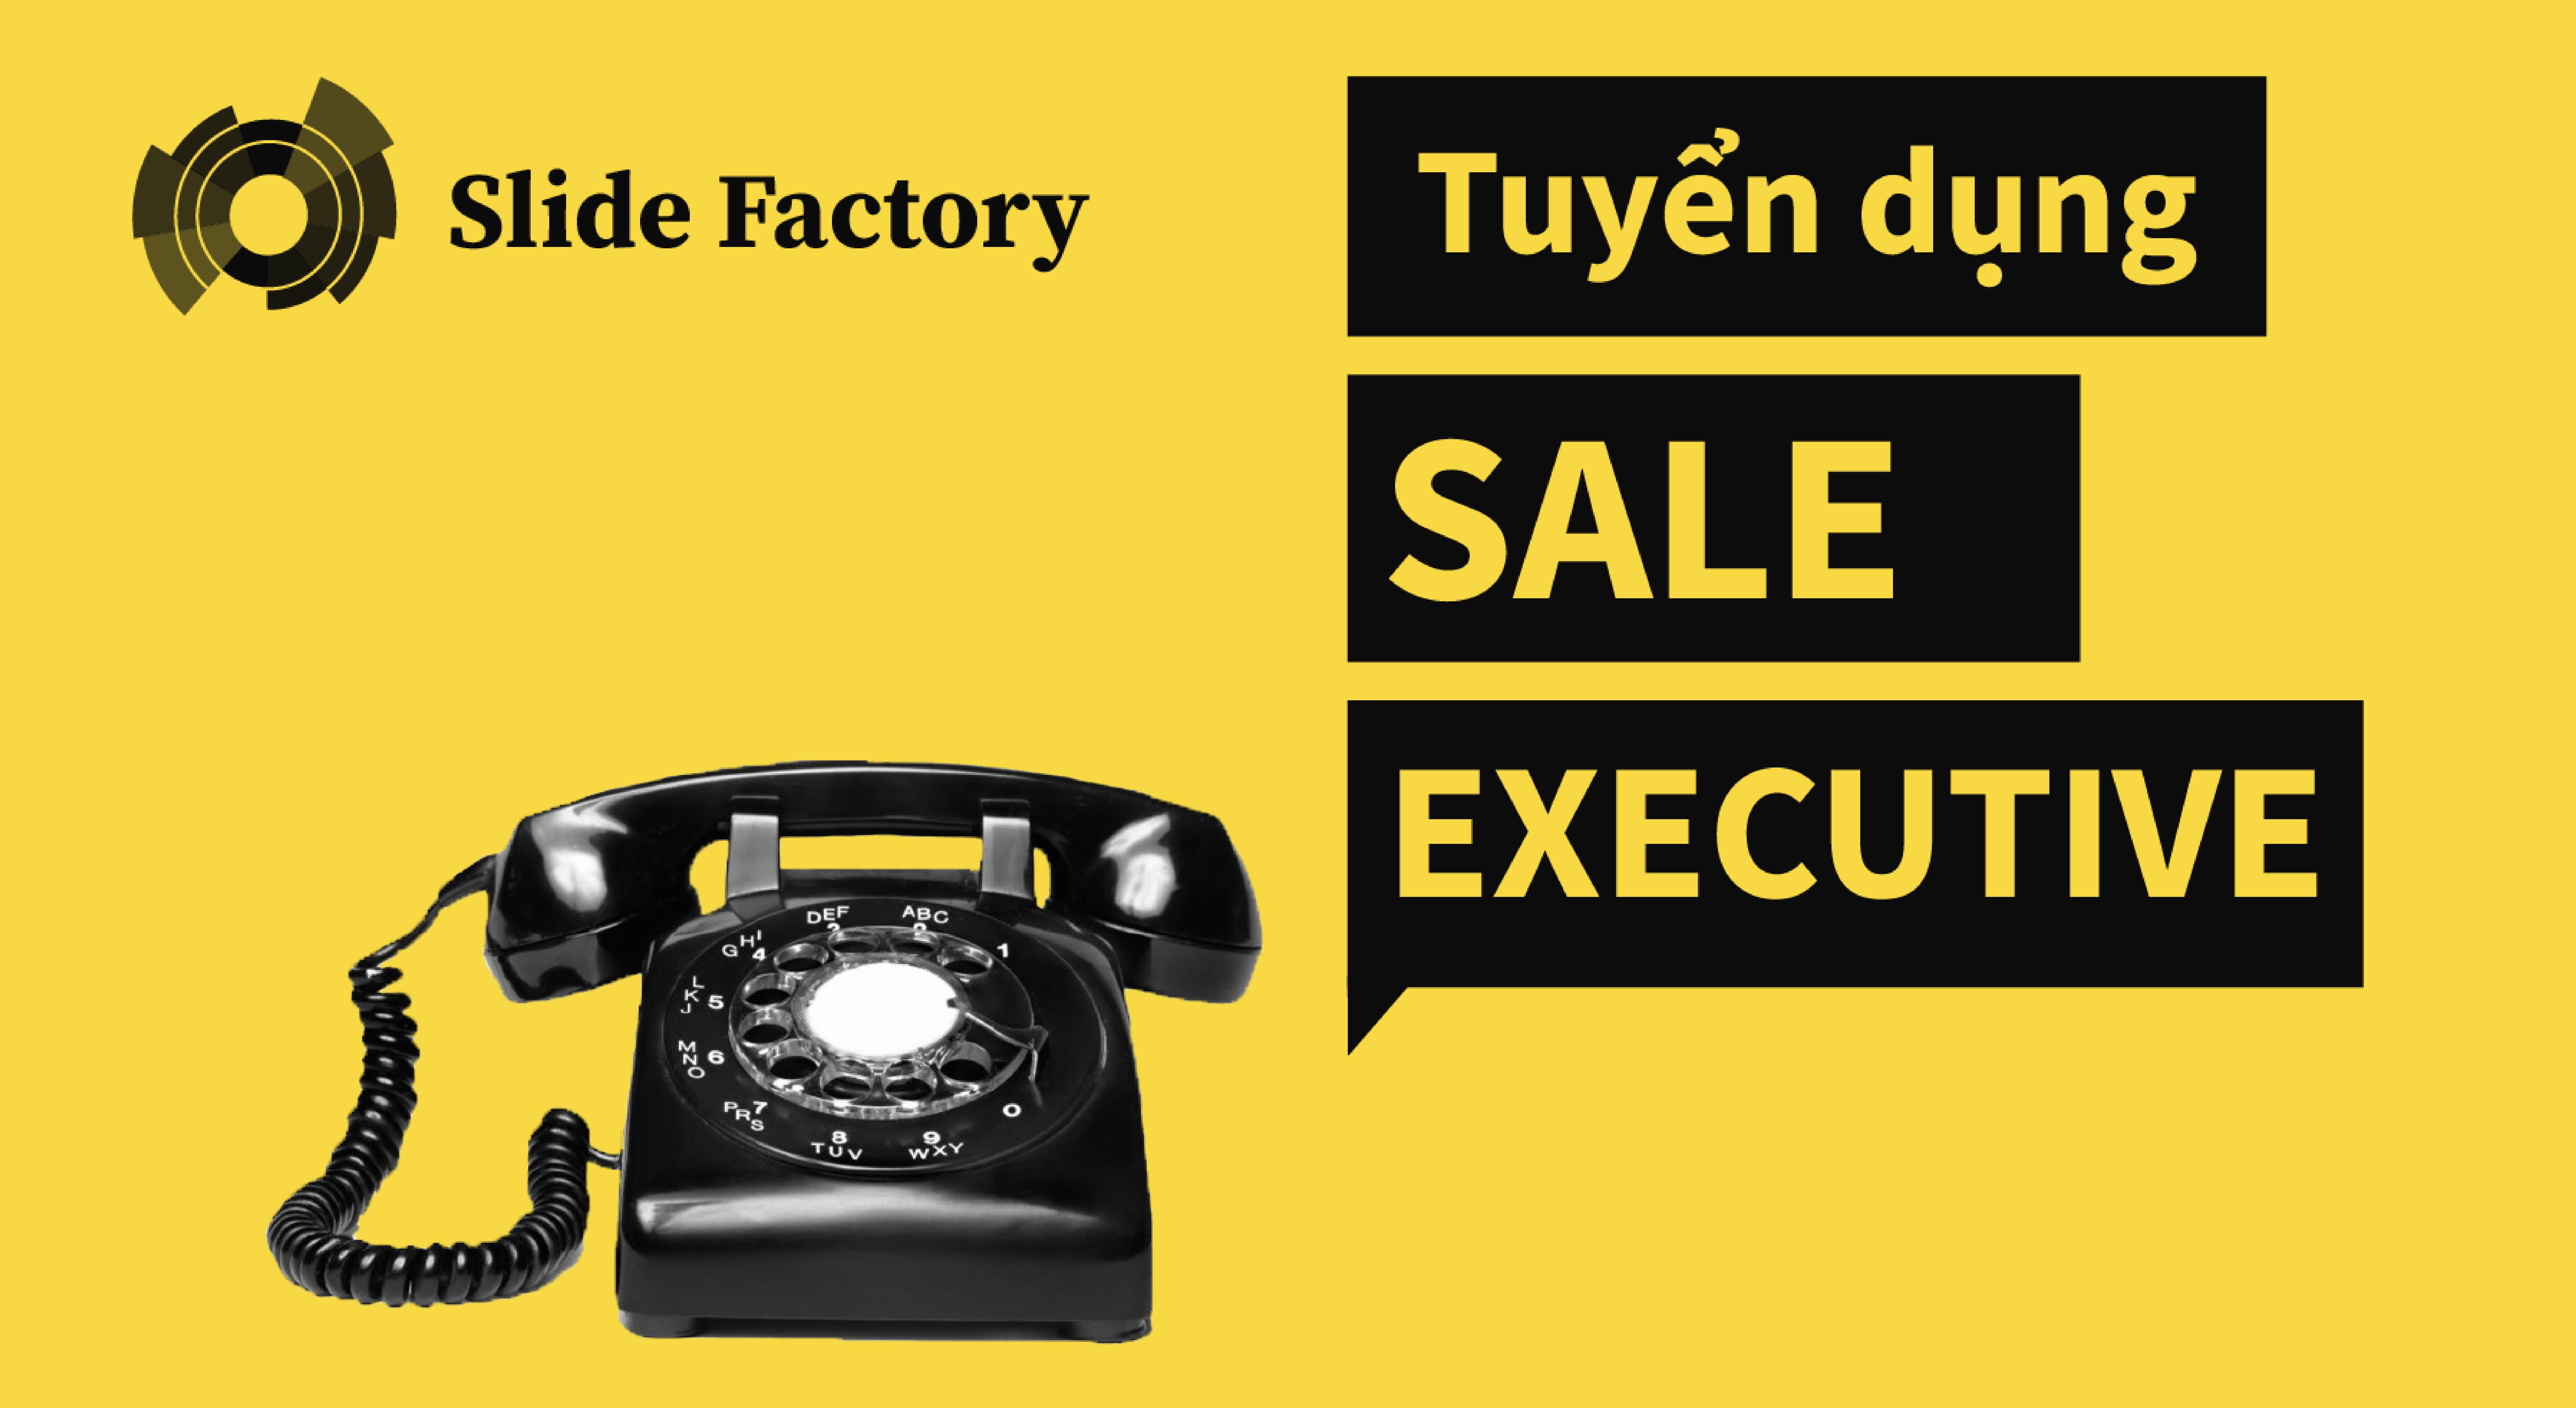 SLIDE FACTORY tuyển dụng Sale Executive